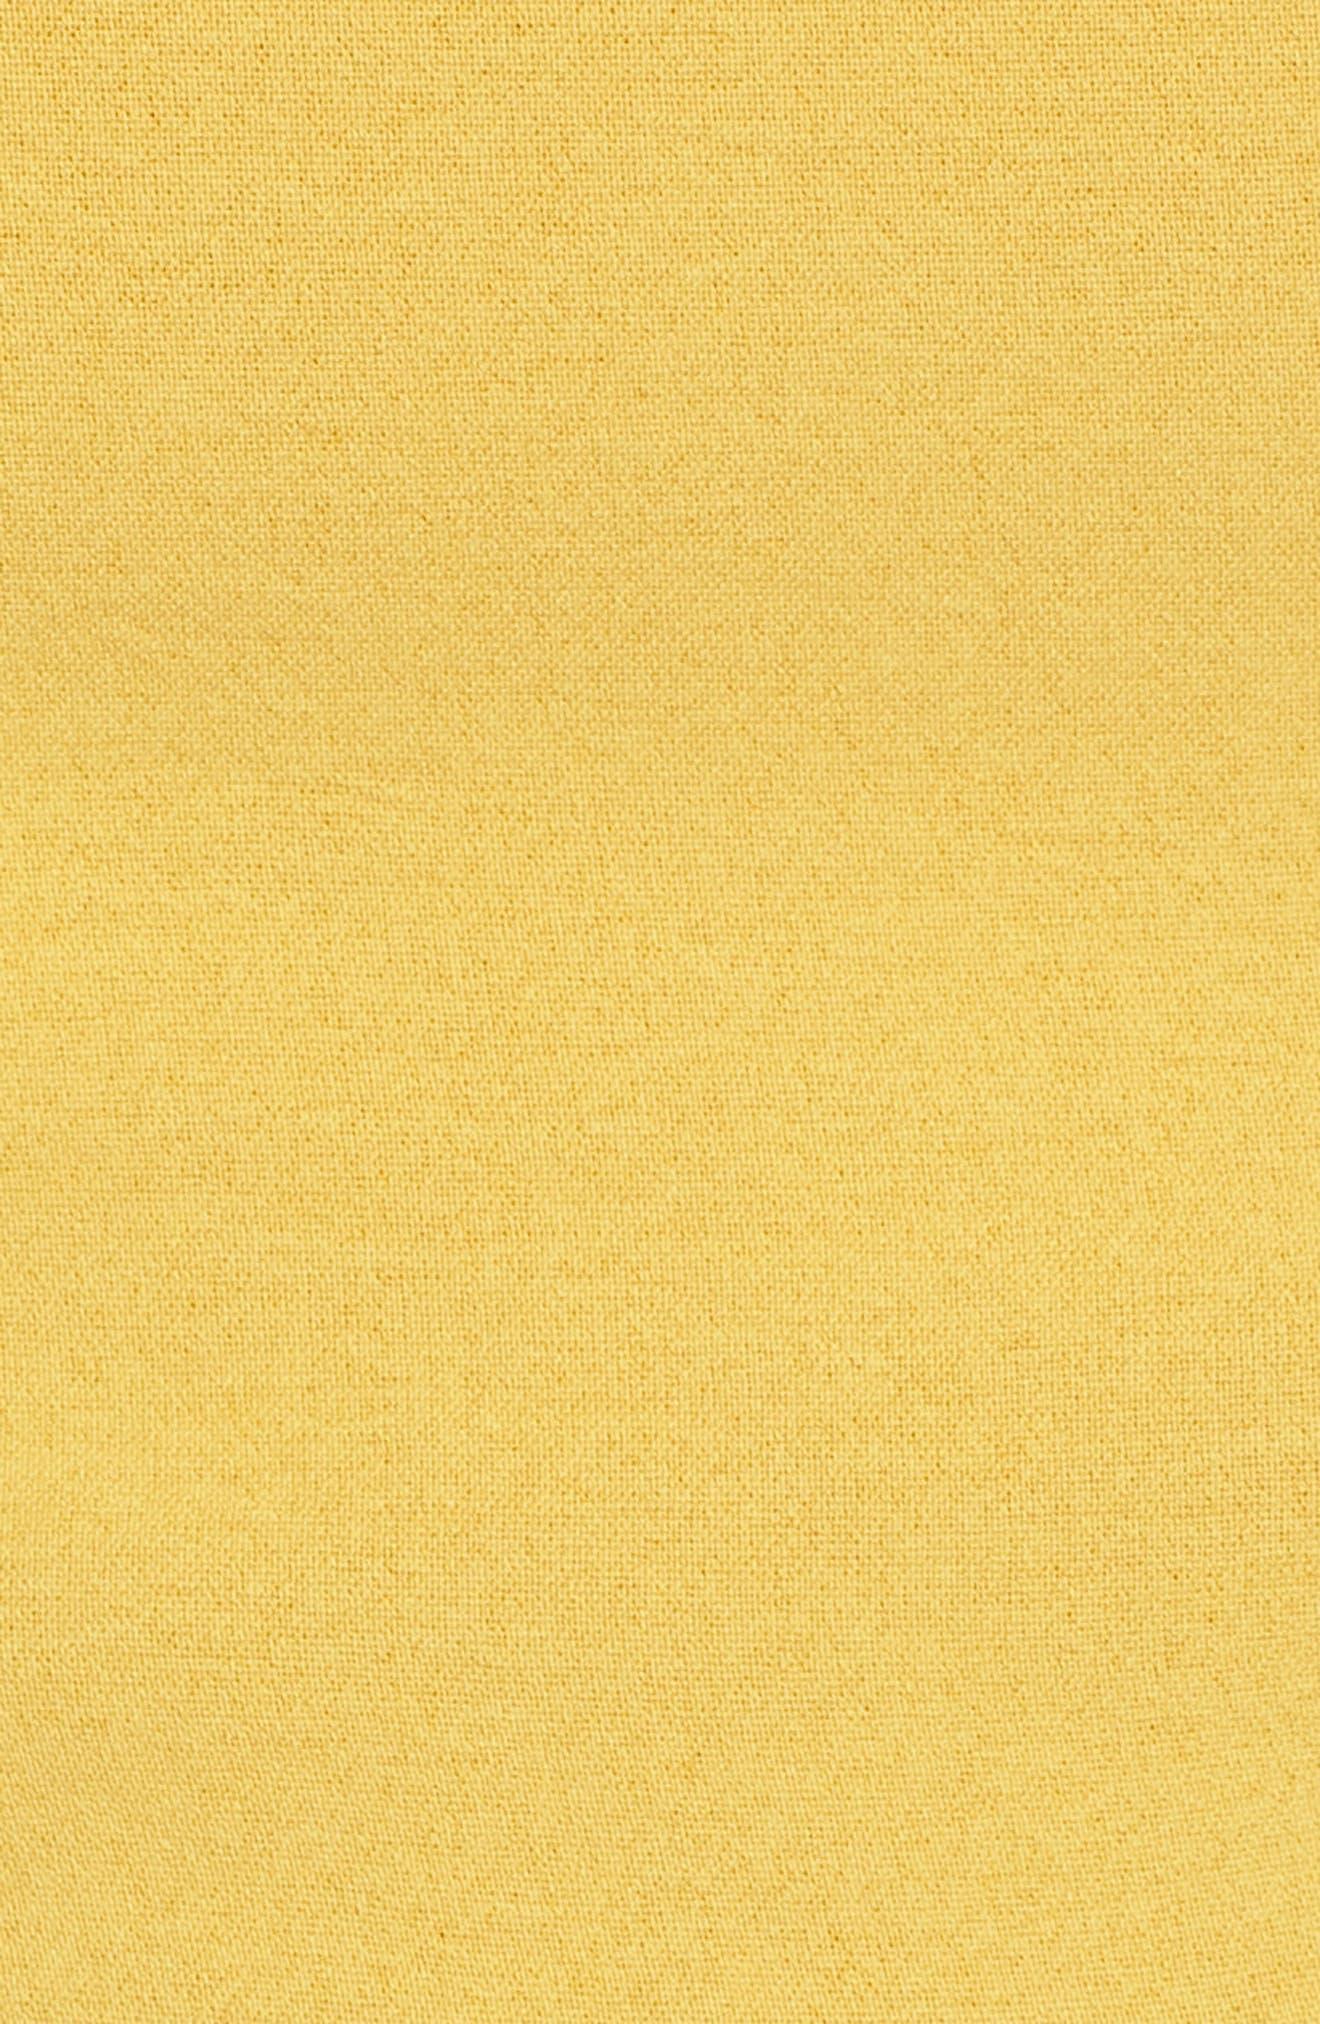 Chriselle x J.O.A. Asymmetrical Peplum Top,                             Alternate thumbnail 9, color,                             Roman Gold